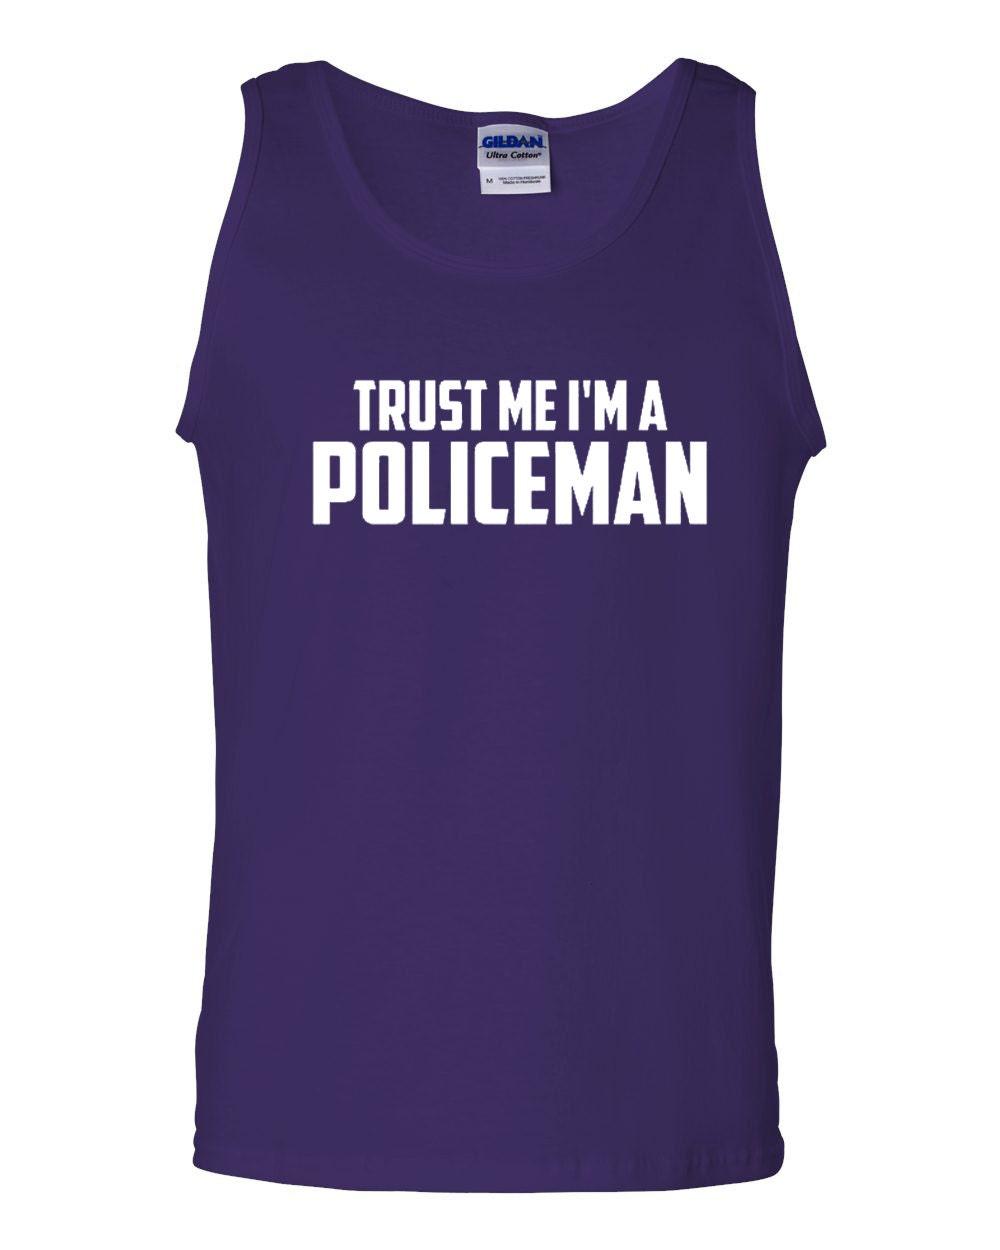 City Shirts Trust Me I'm A Policeman Statement Adult Tank Top at Sears.com